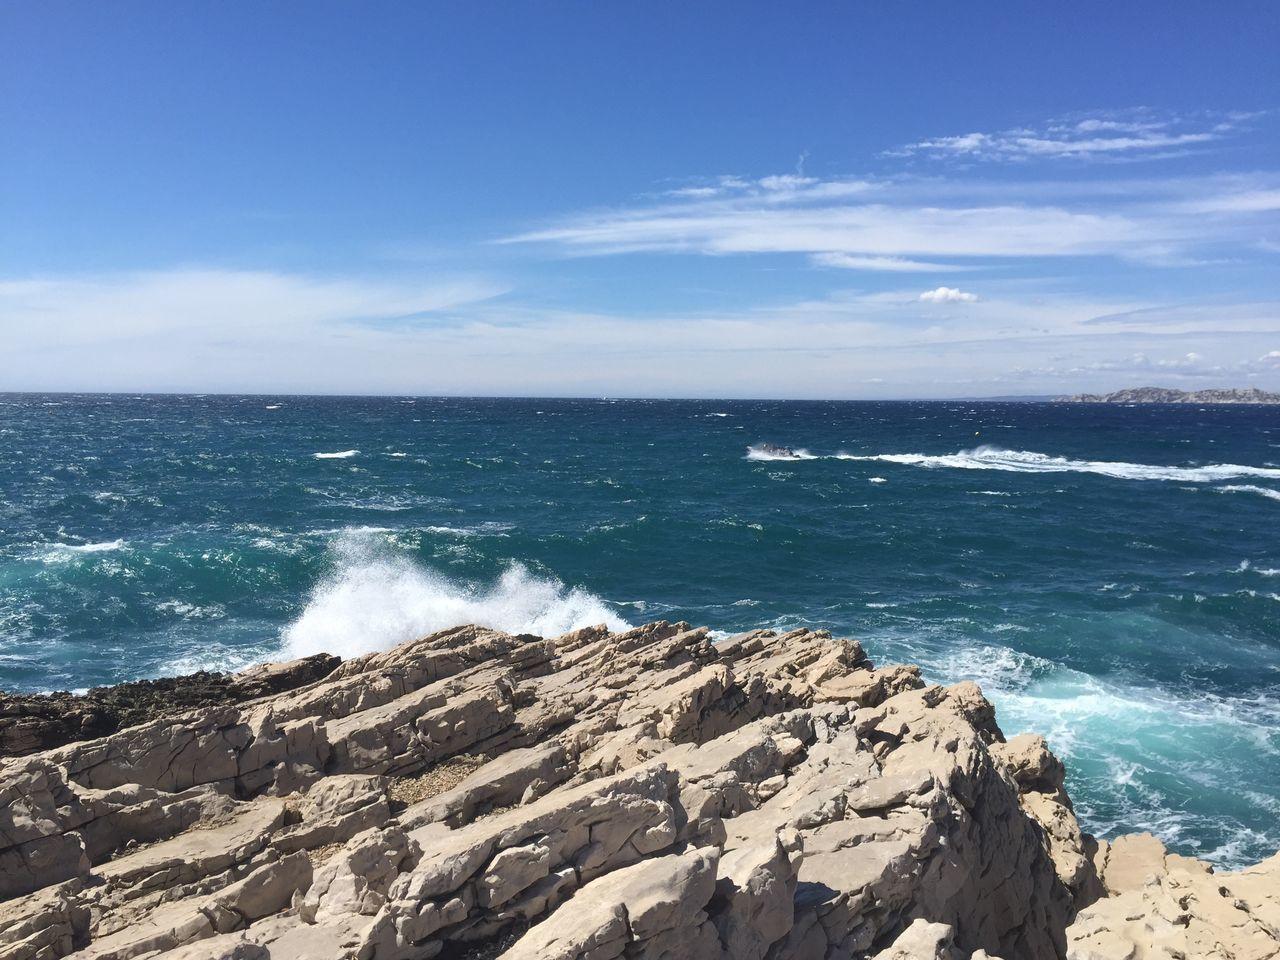 Scenic View Of Sea Waves Splashing Towards Rock Against Sky